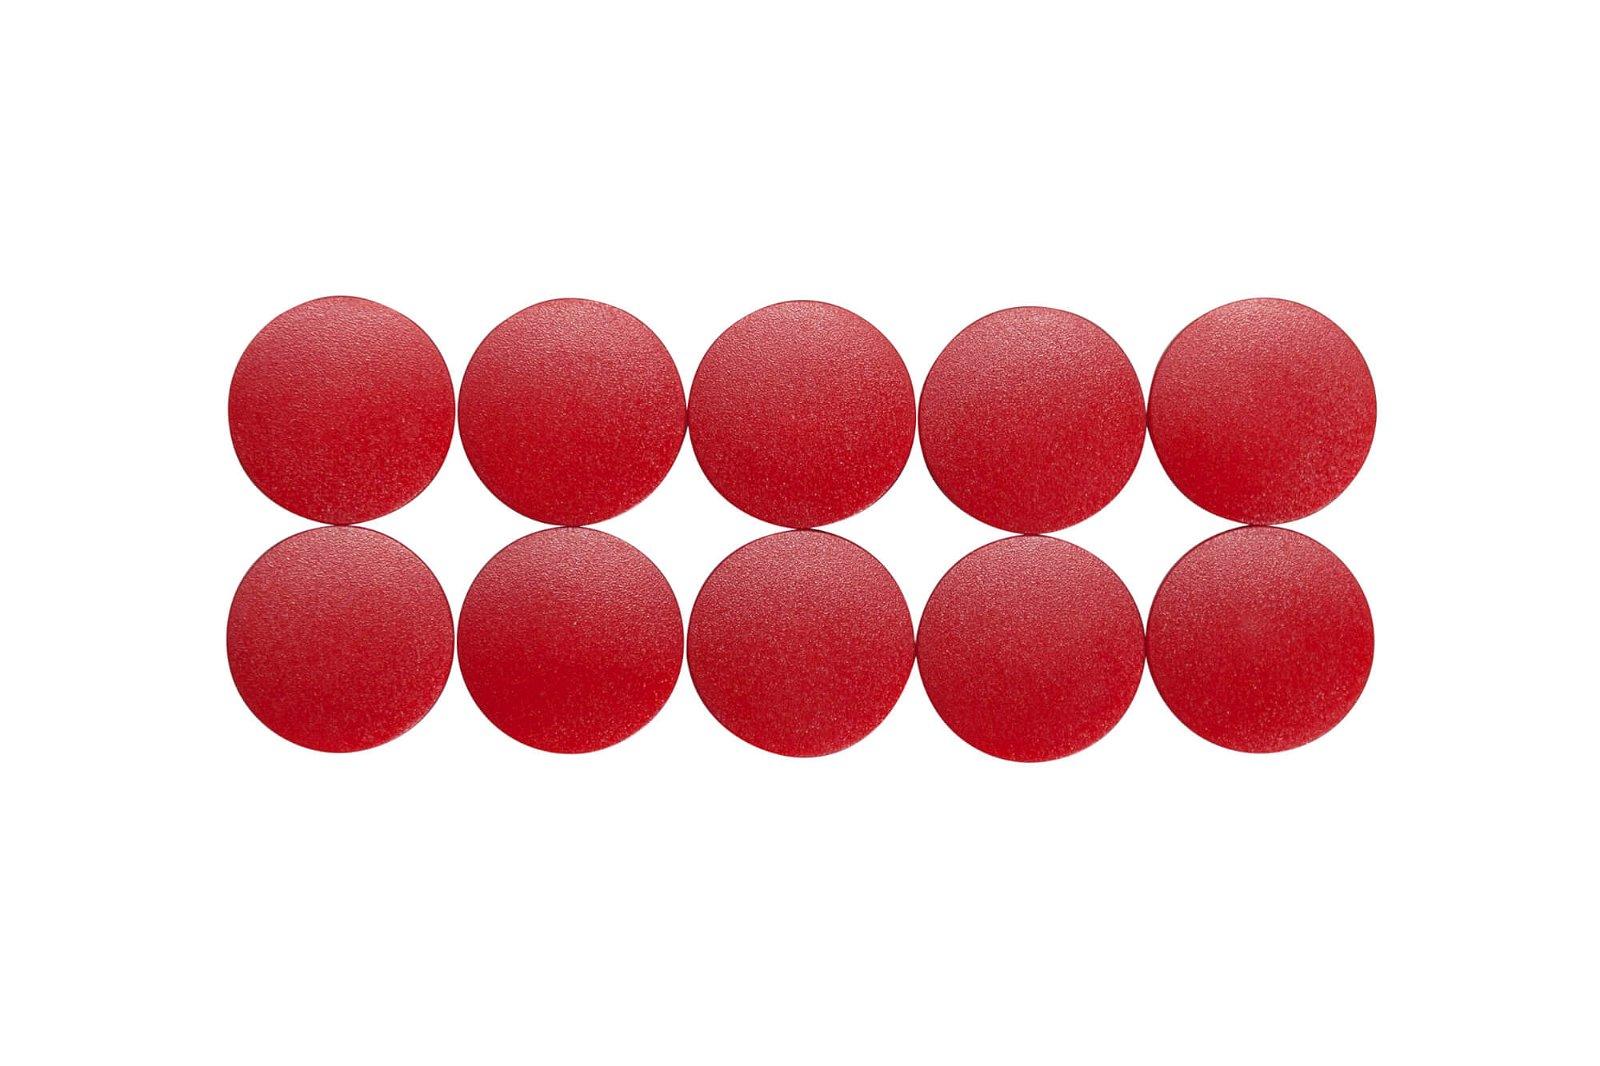 Magnet MAULsolid Ø 24 mm, 0,6 kg Haftkraft, 10 St./Ktn., rot